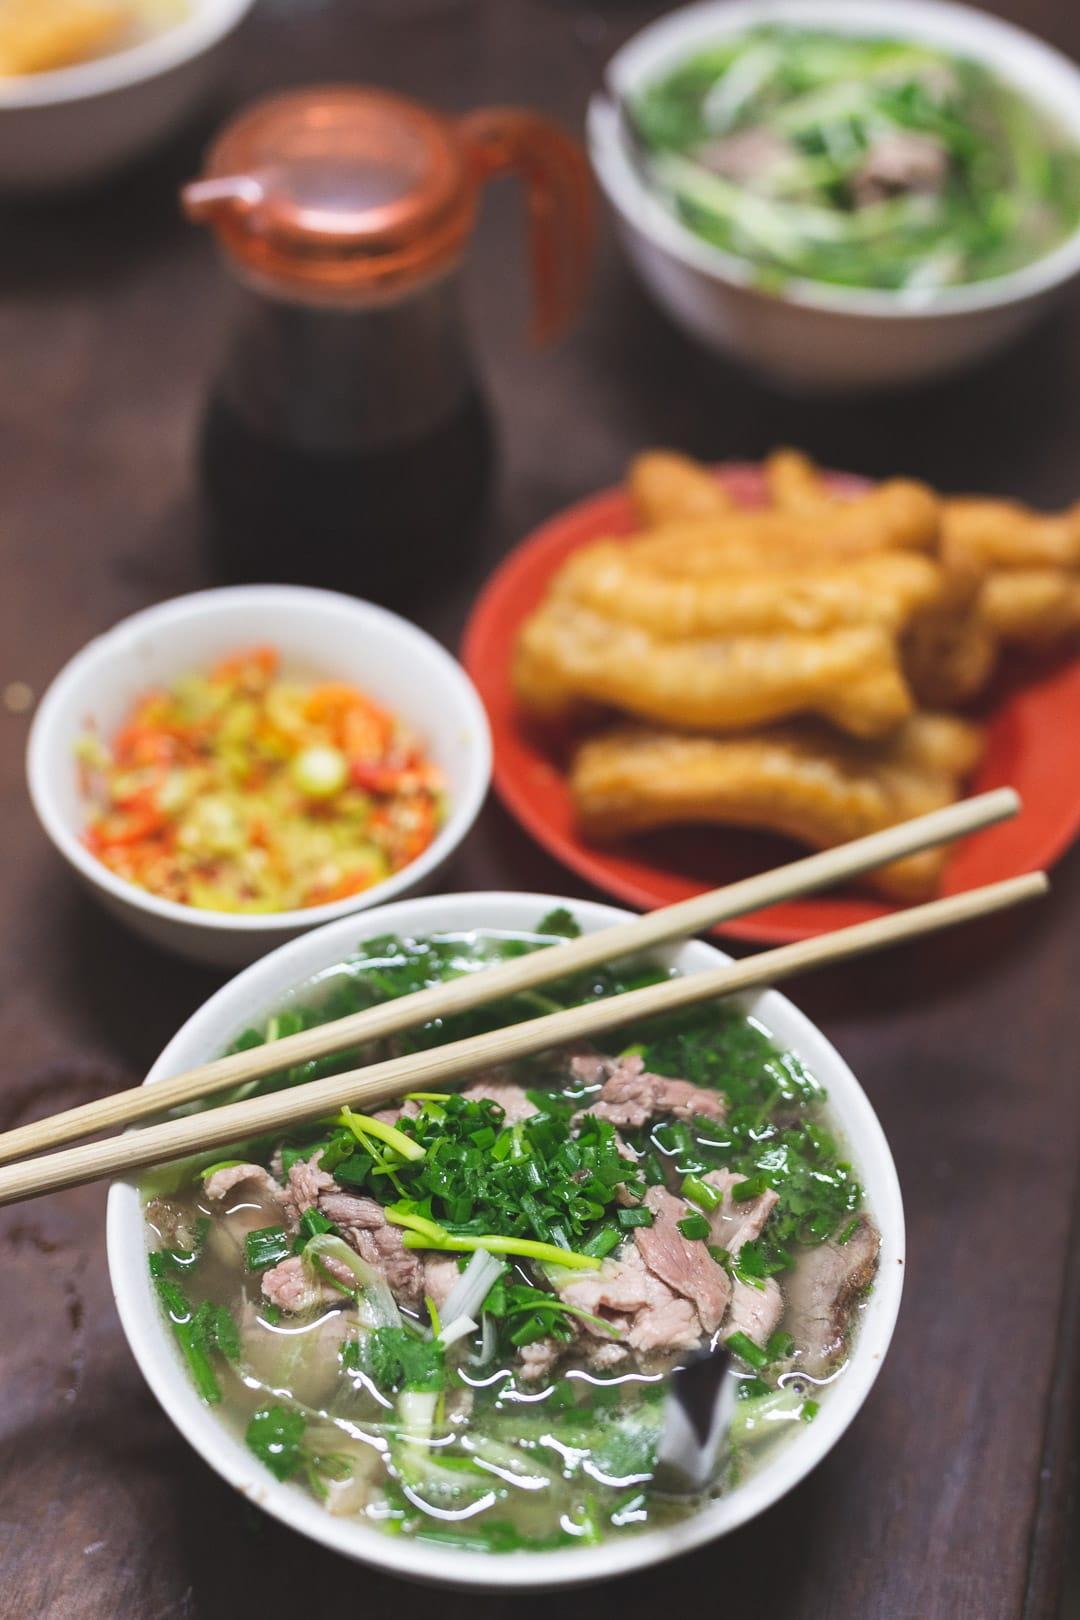 A bowl of the best pho in Hanoi, Vietnam from Pho Gia Truyen Bat Dan restaurant